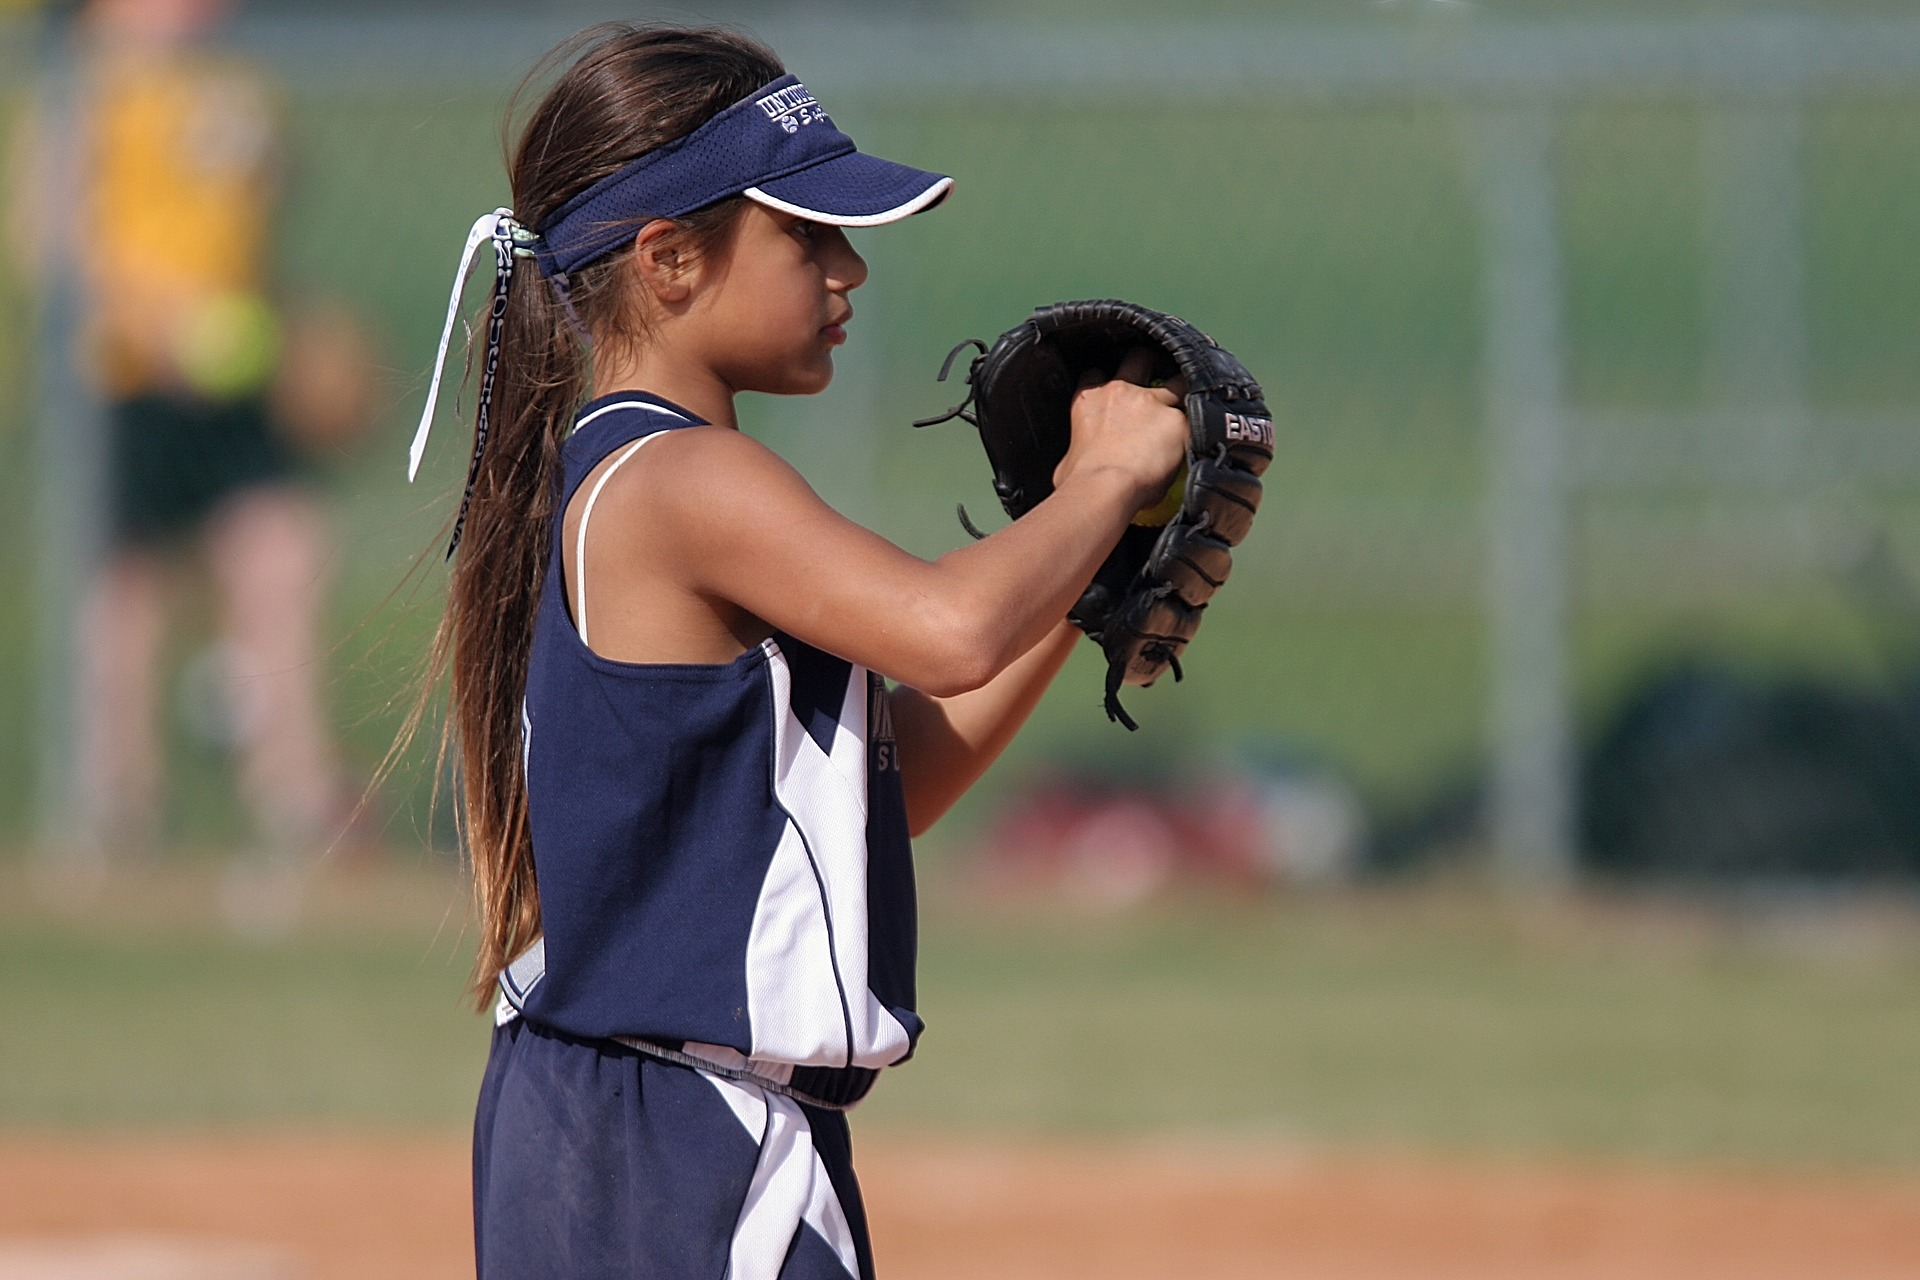 Young Girl Baseball Pitcher   Kids Car Donations